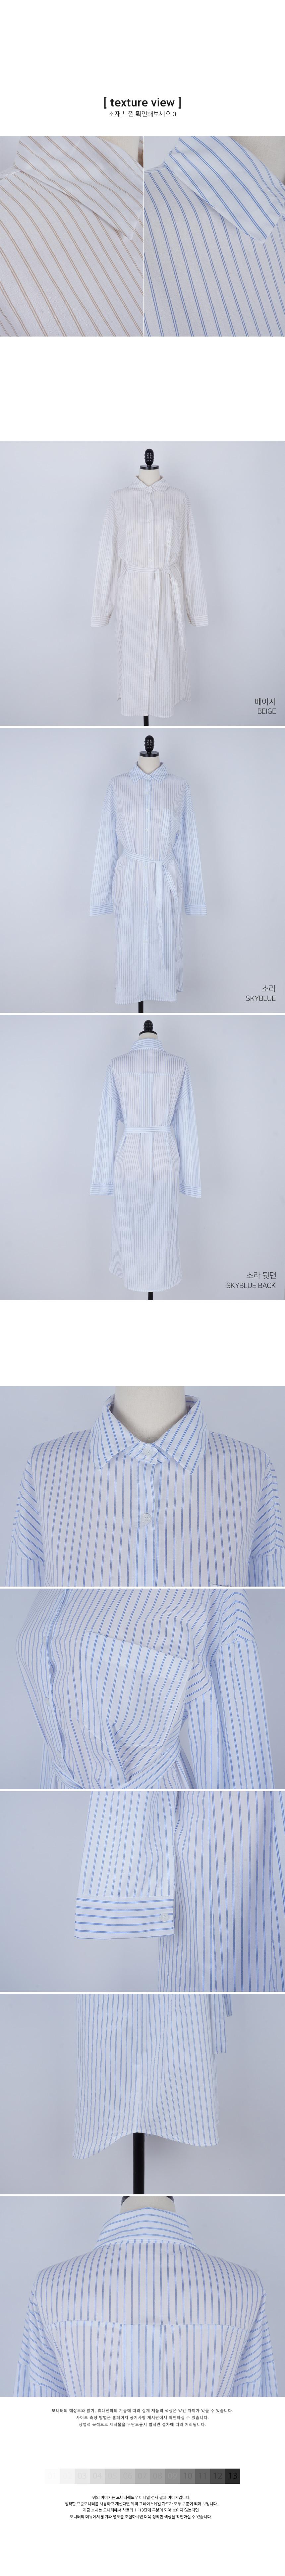 Twin shirt dress